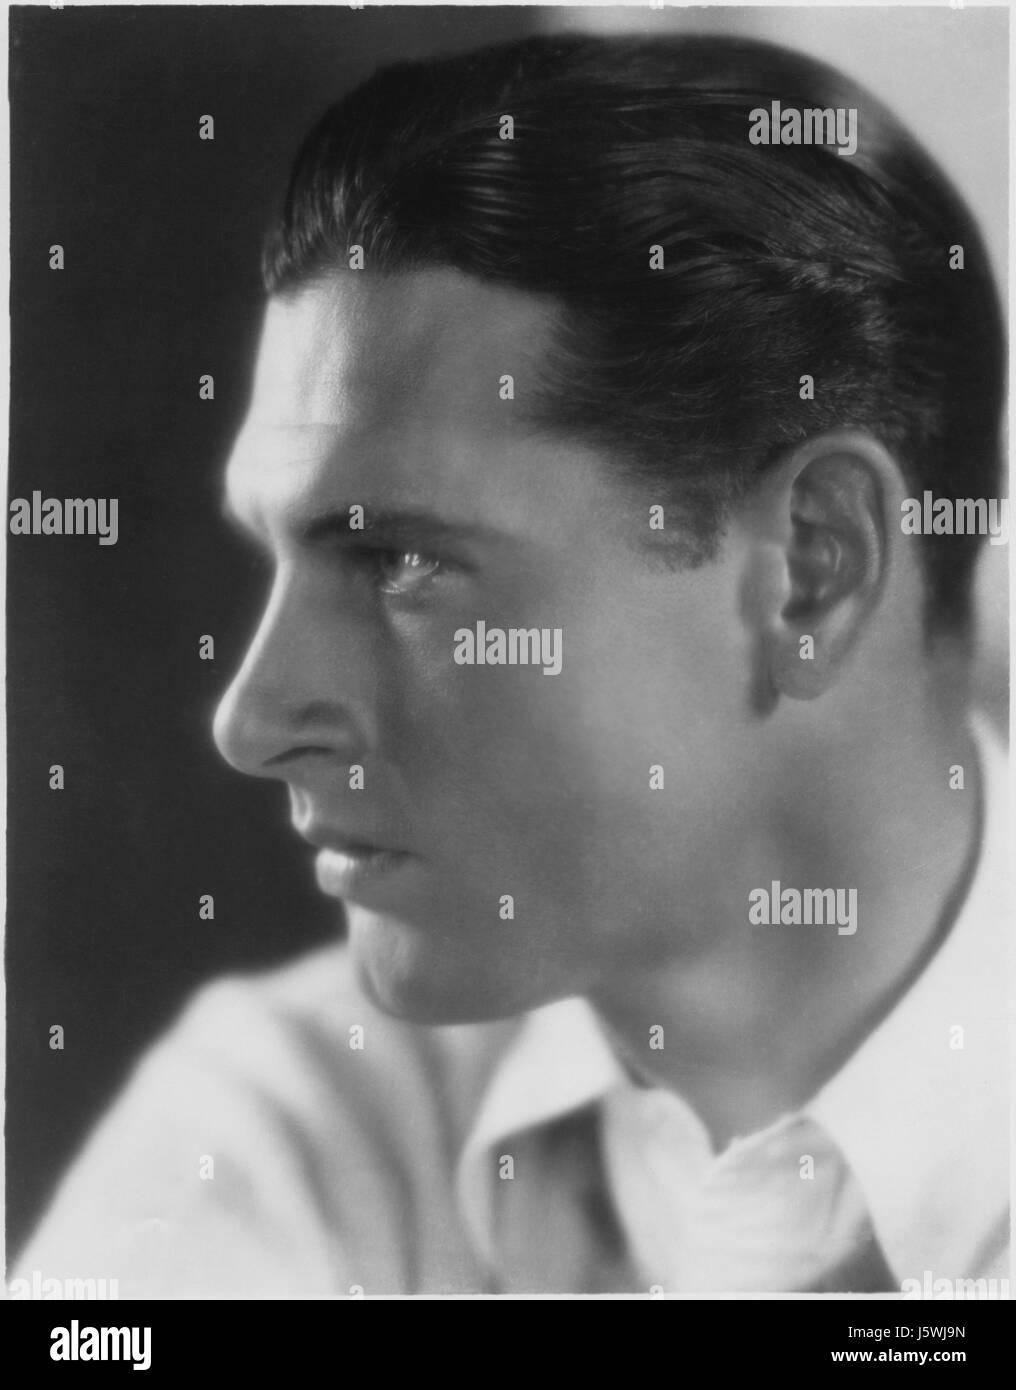 Actor Richard Arlen, Publicity Portrait Looking Right, 1920's - Stock Image